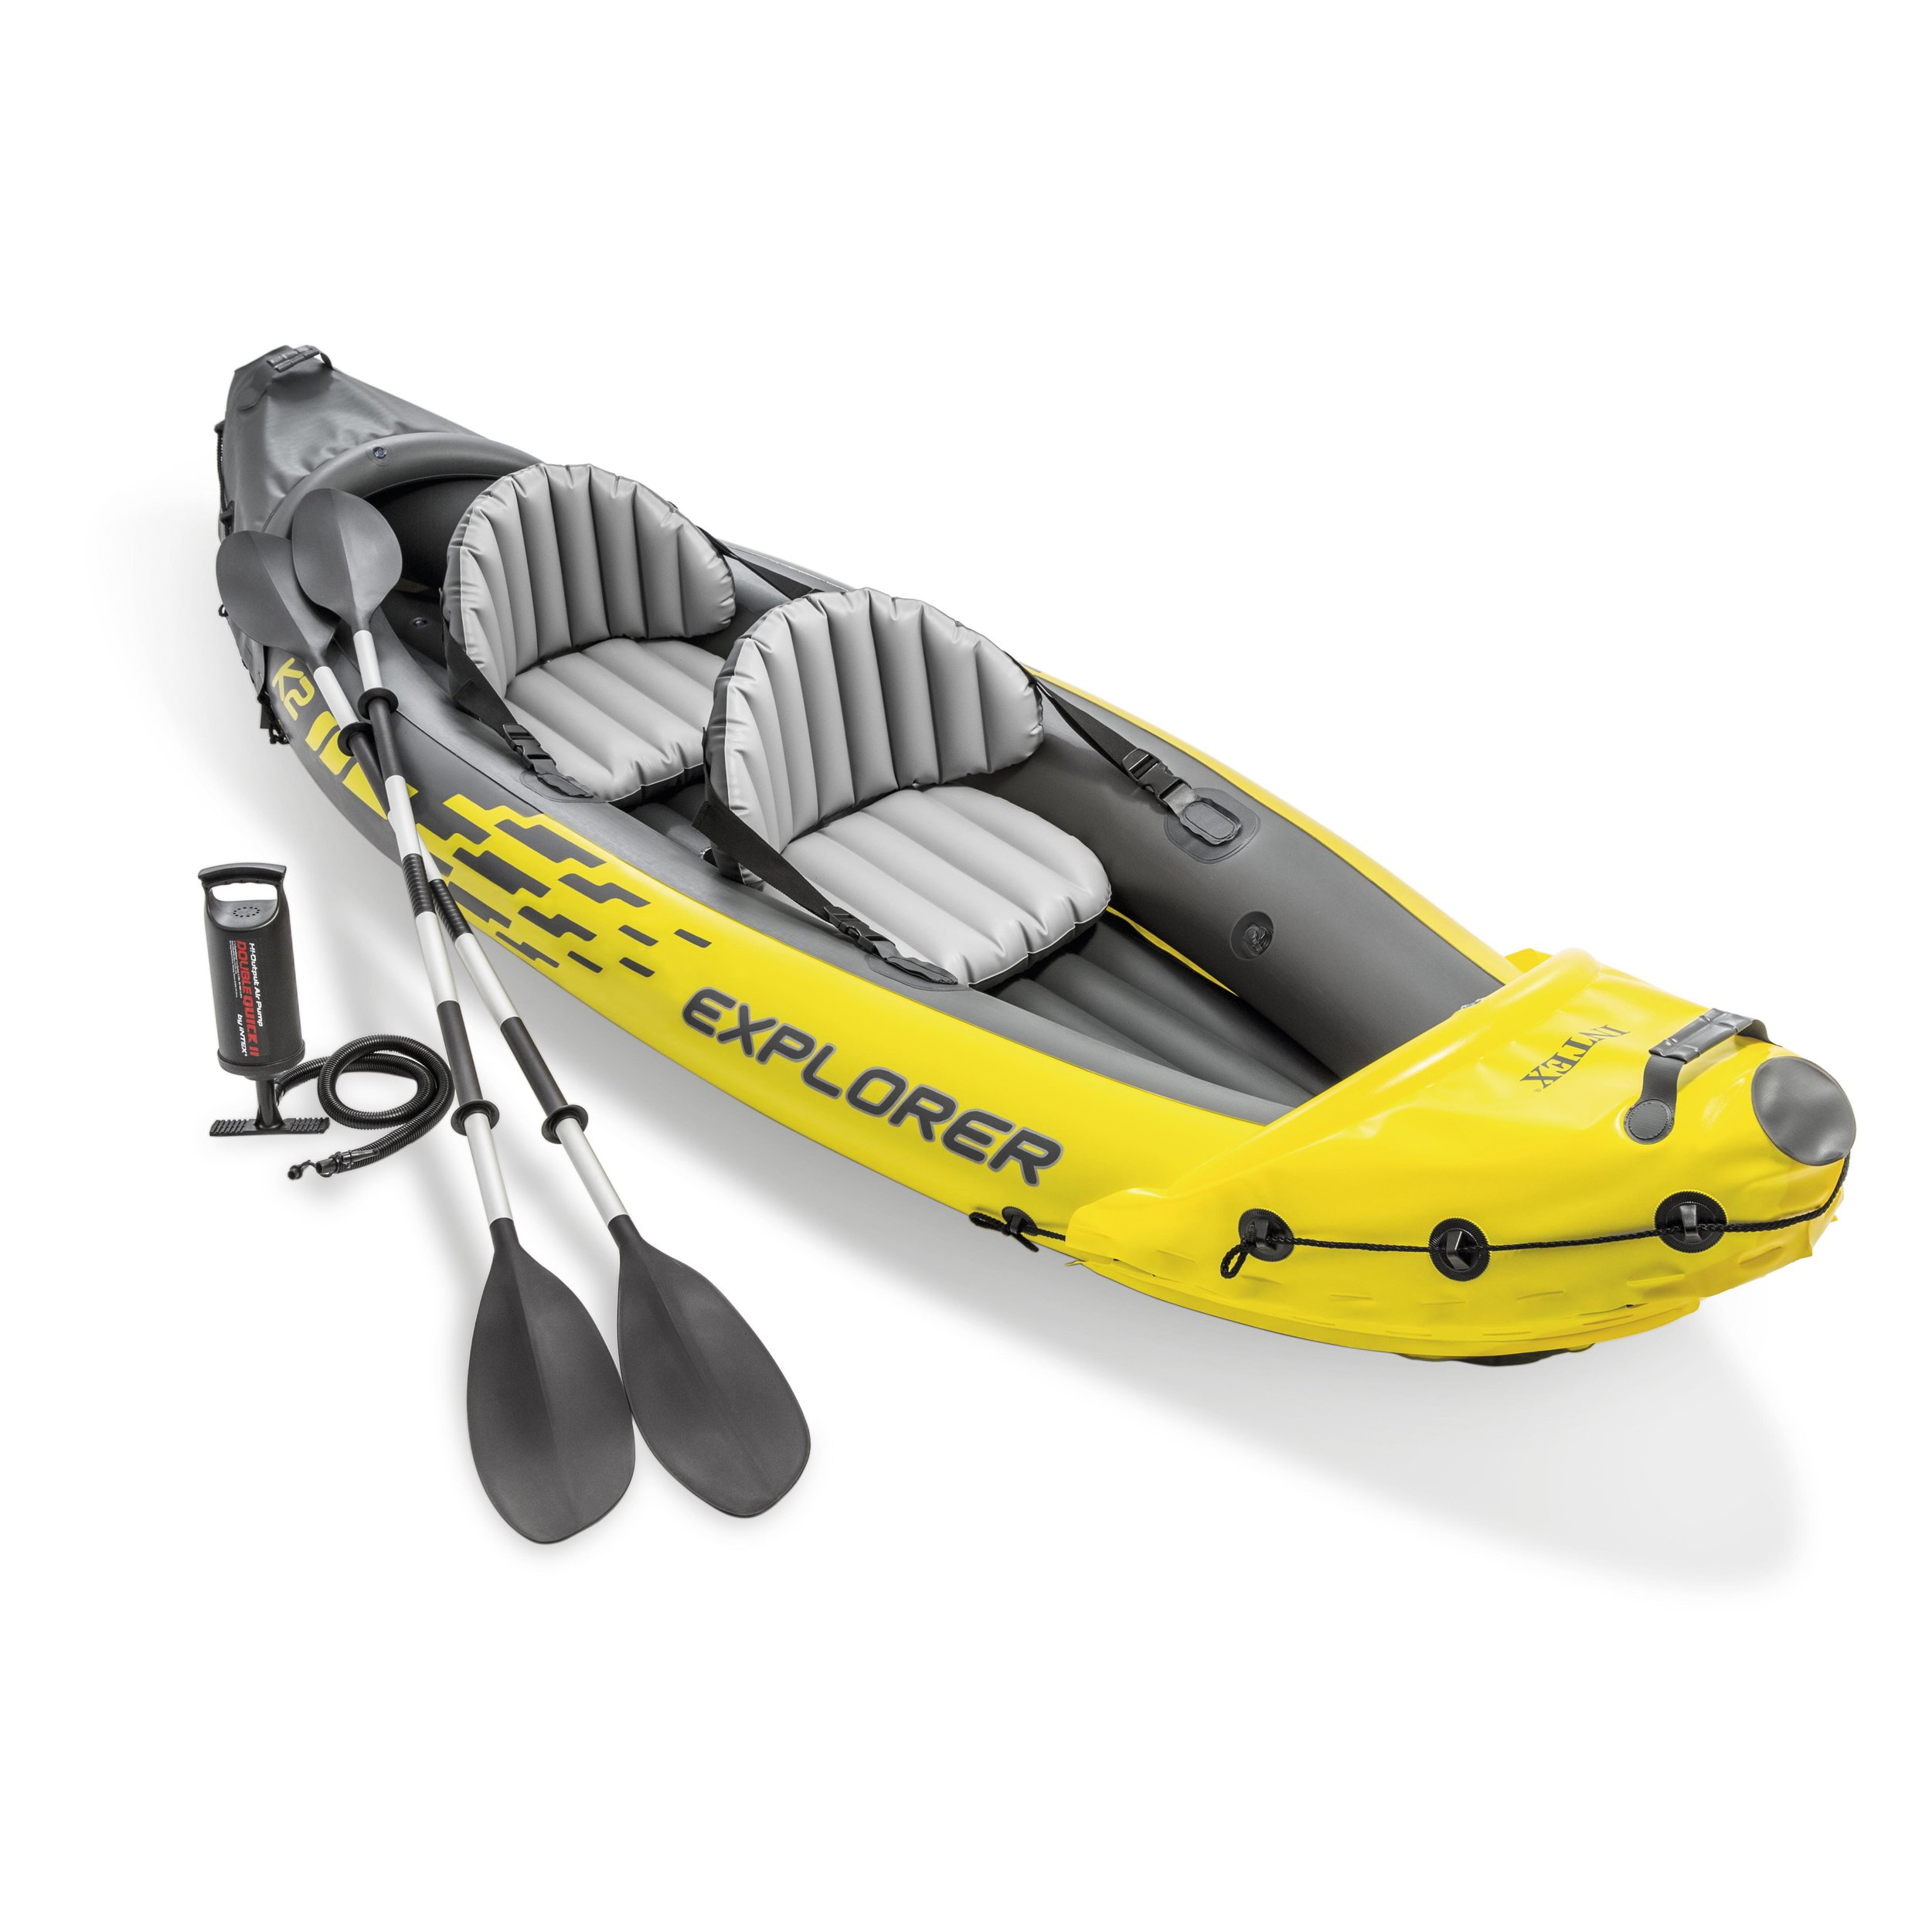 Intex Explorer K2 Kayak, 2-Person Inflatable Kayak Set with Aluminum Oars and High Output Air Pump by Intex